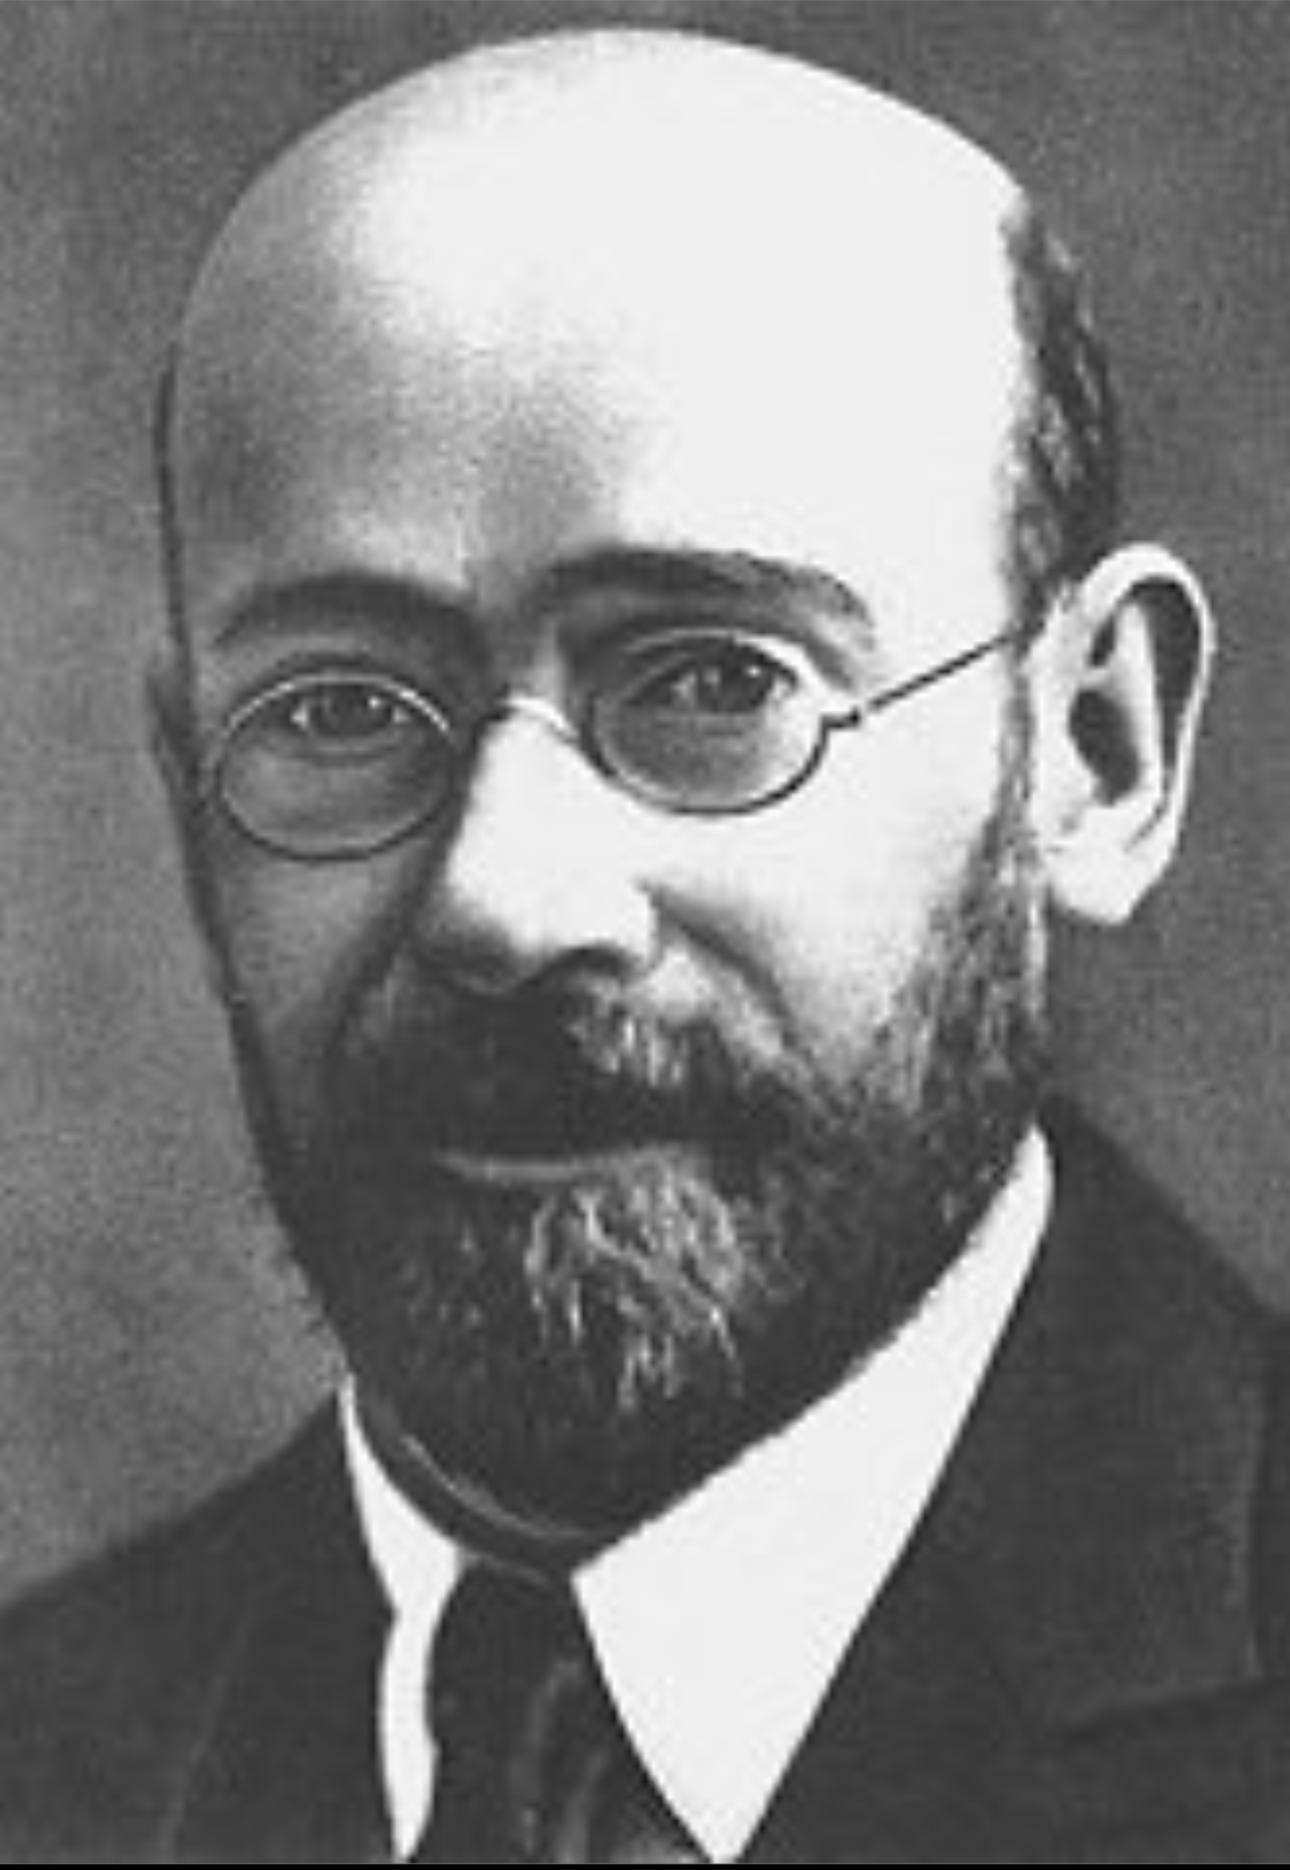 Janusz KORKZAC